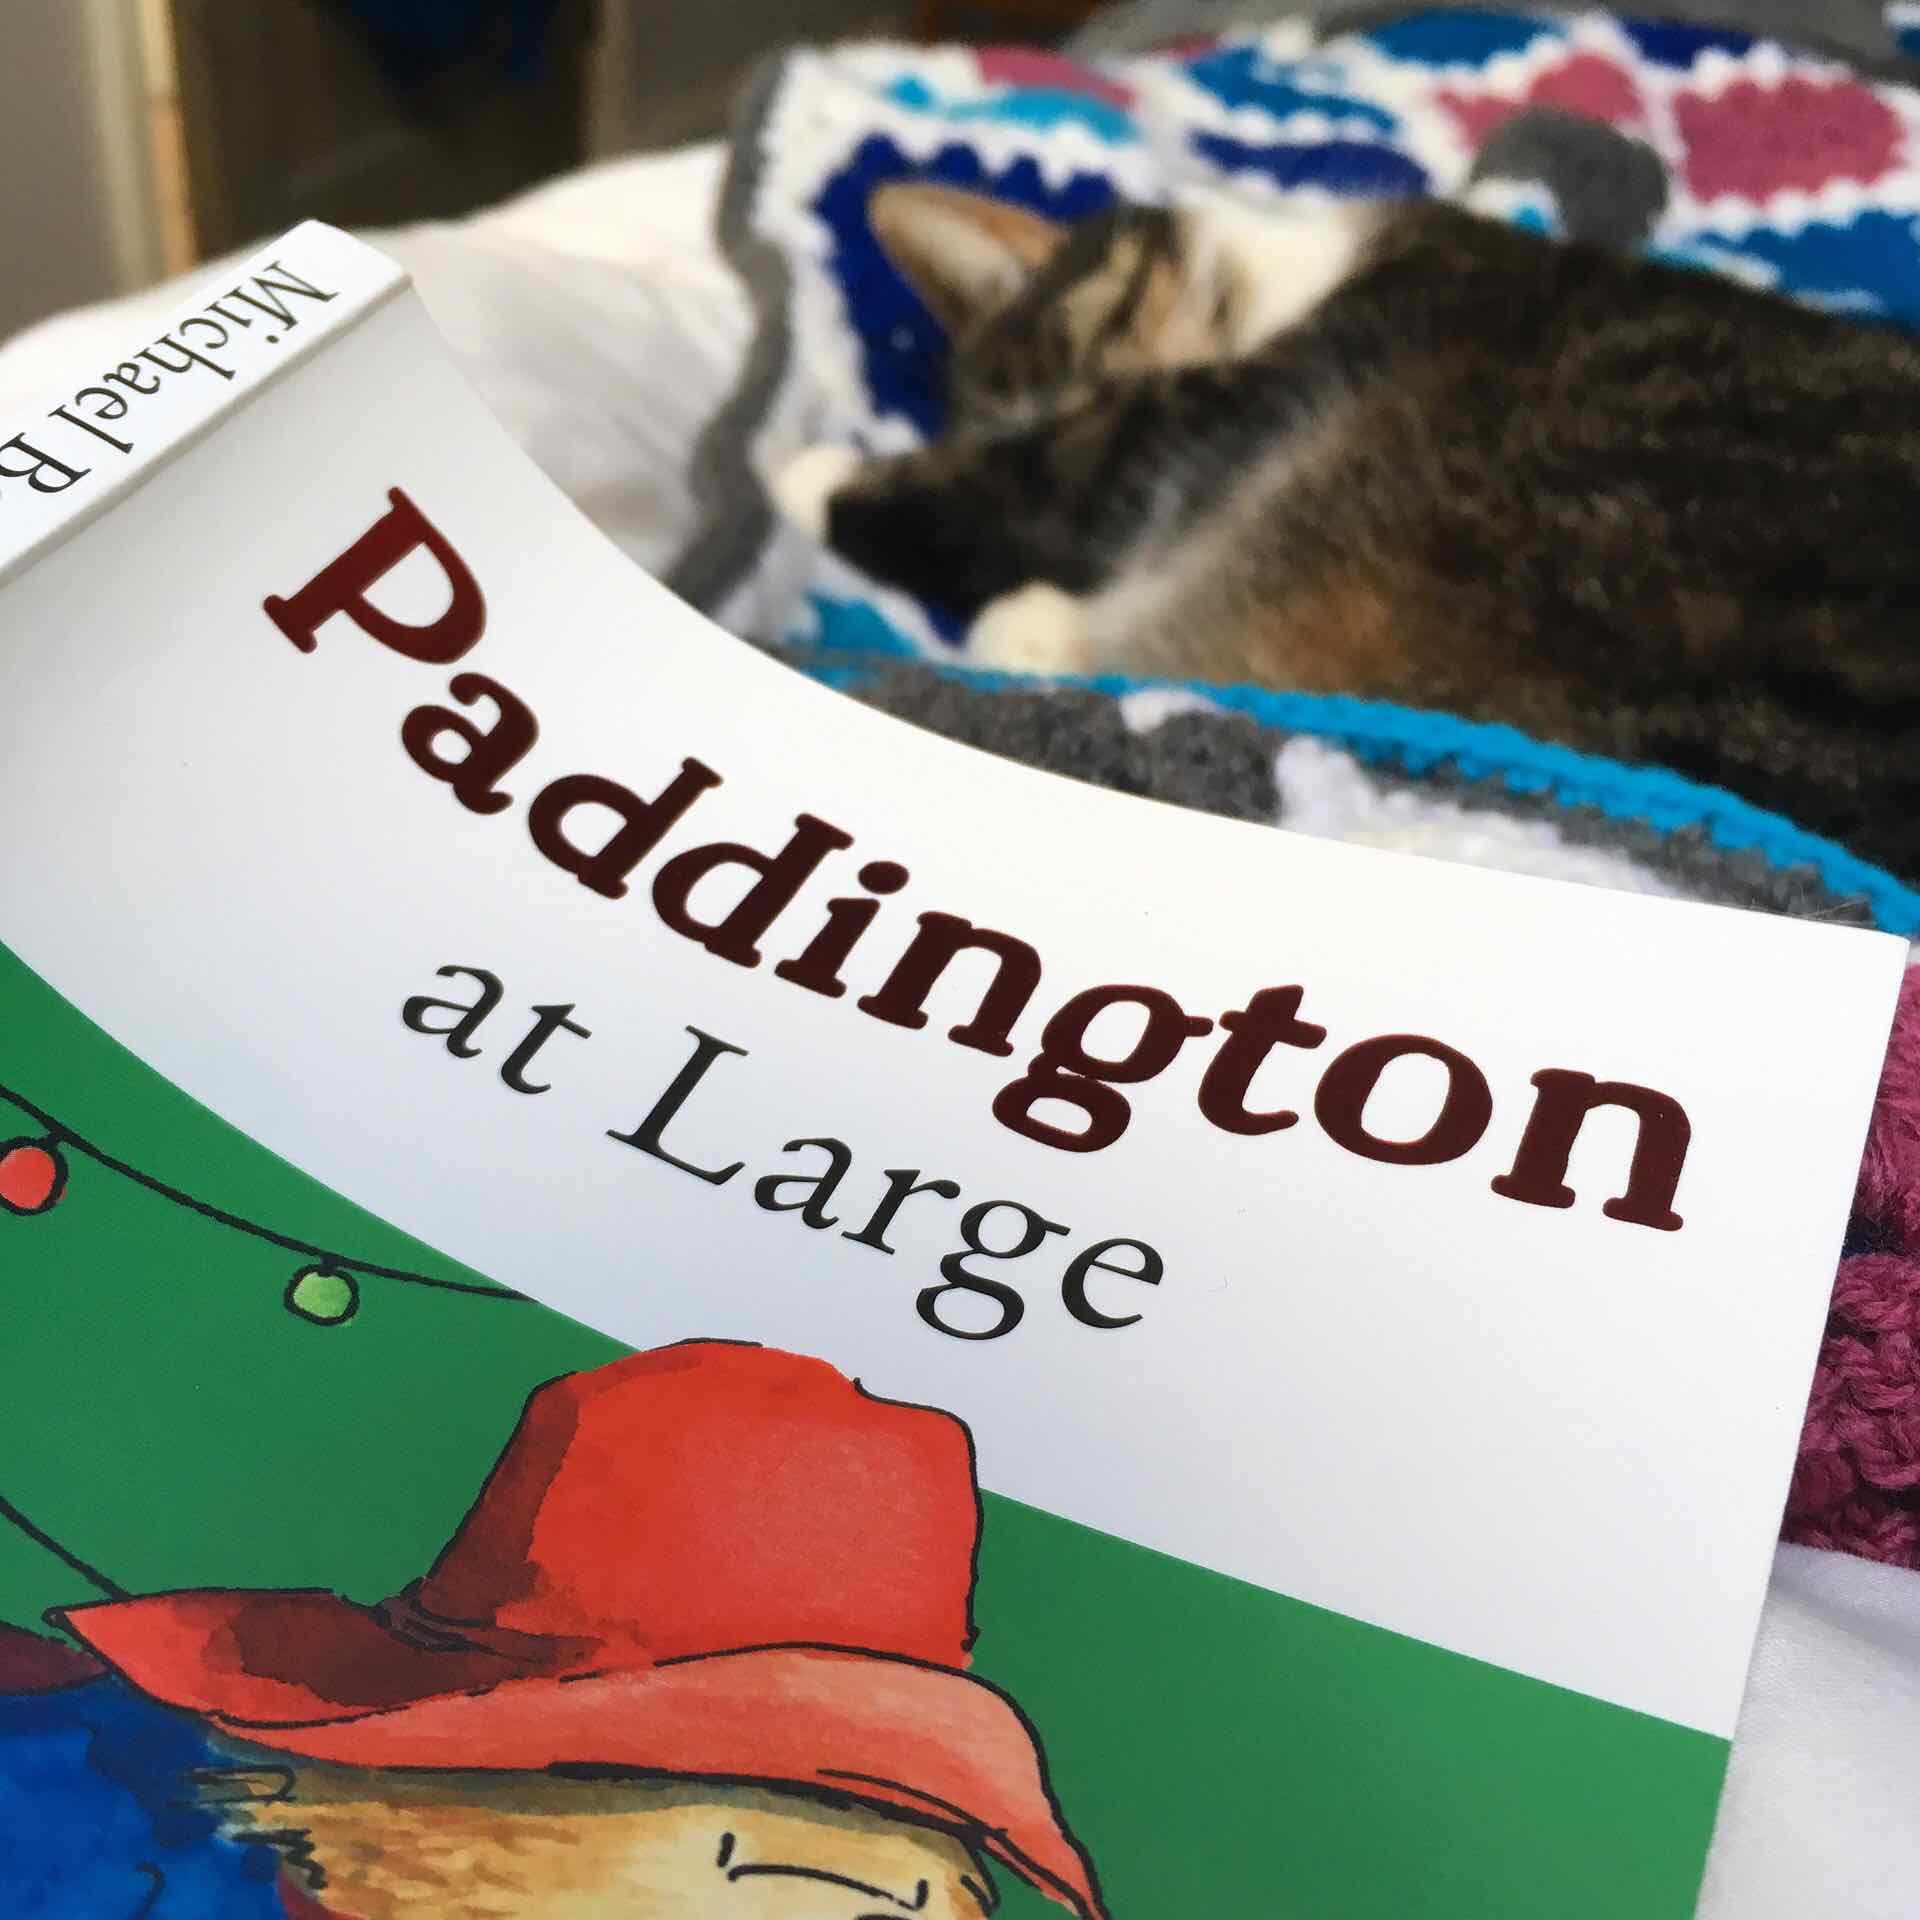 Paddington and napping